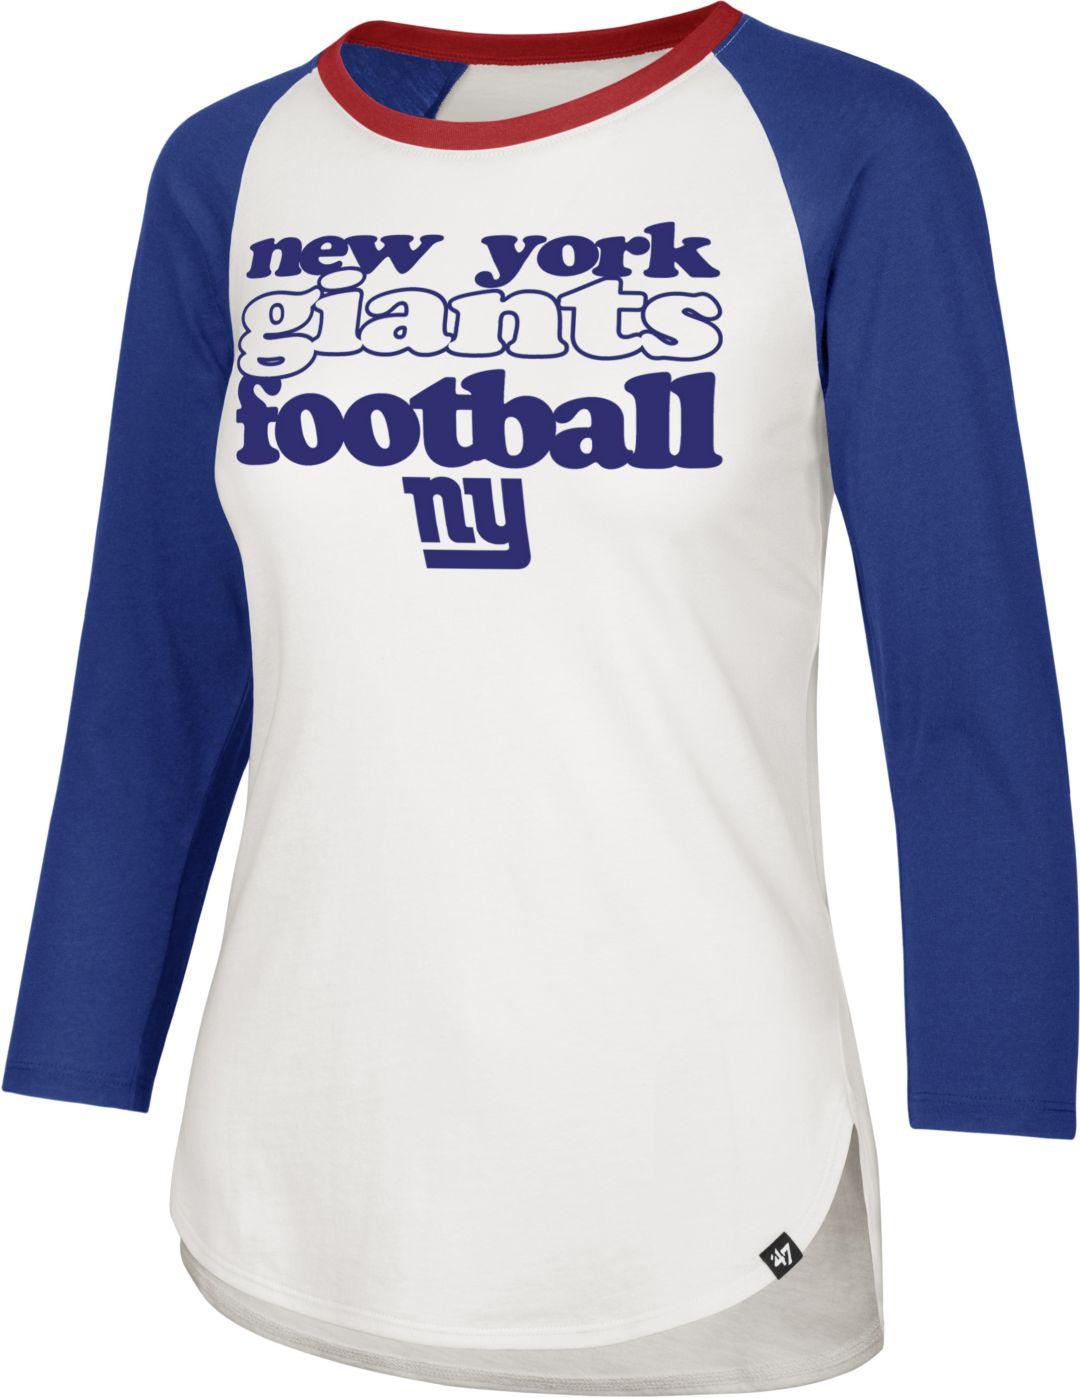 7b7f691b '47 Women's New York Giants Retro Stock Throwback Raglan Shirt